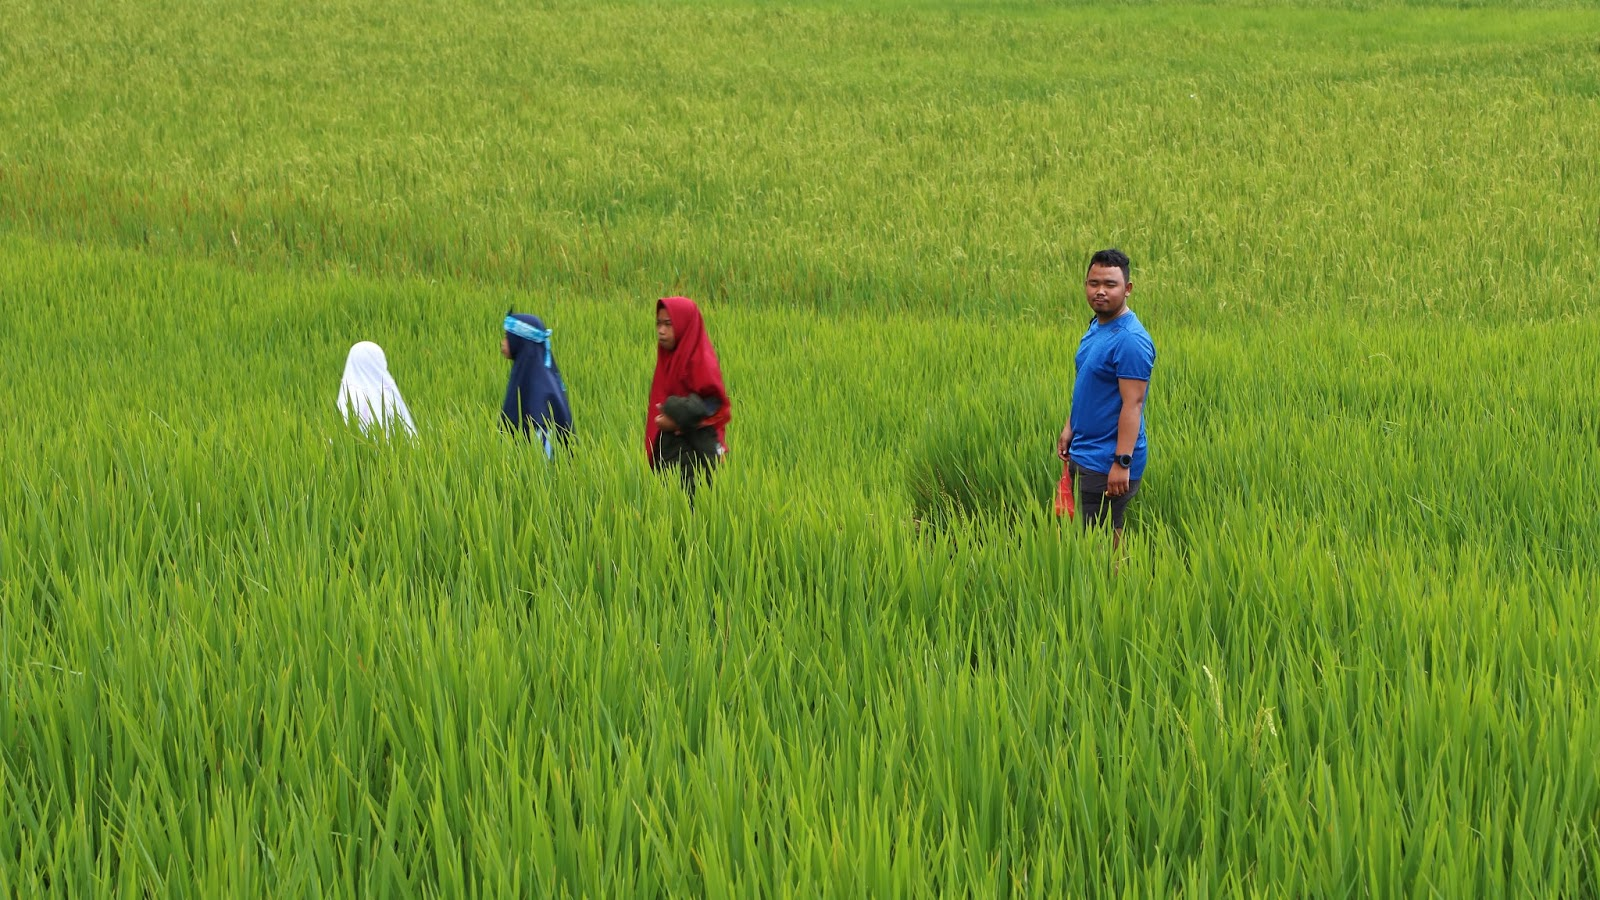 Bersantai Di Wana Wisata Curug Sawer Parakansalak Sukabumi